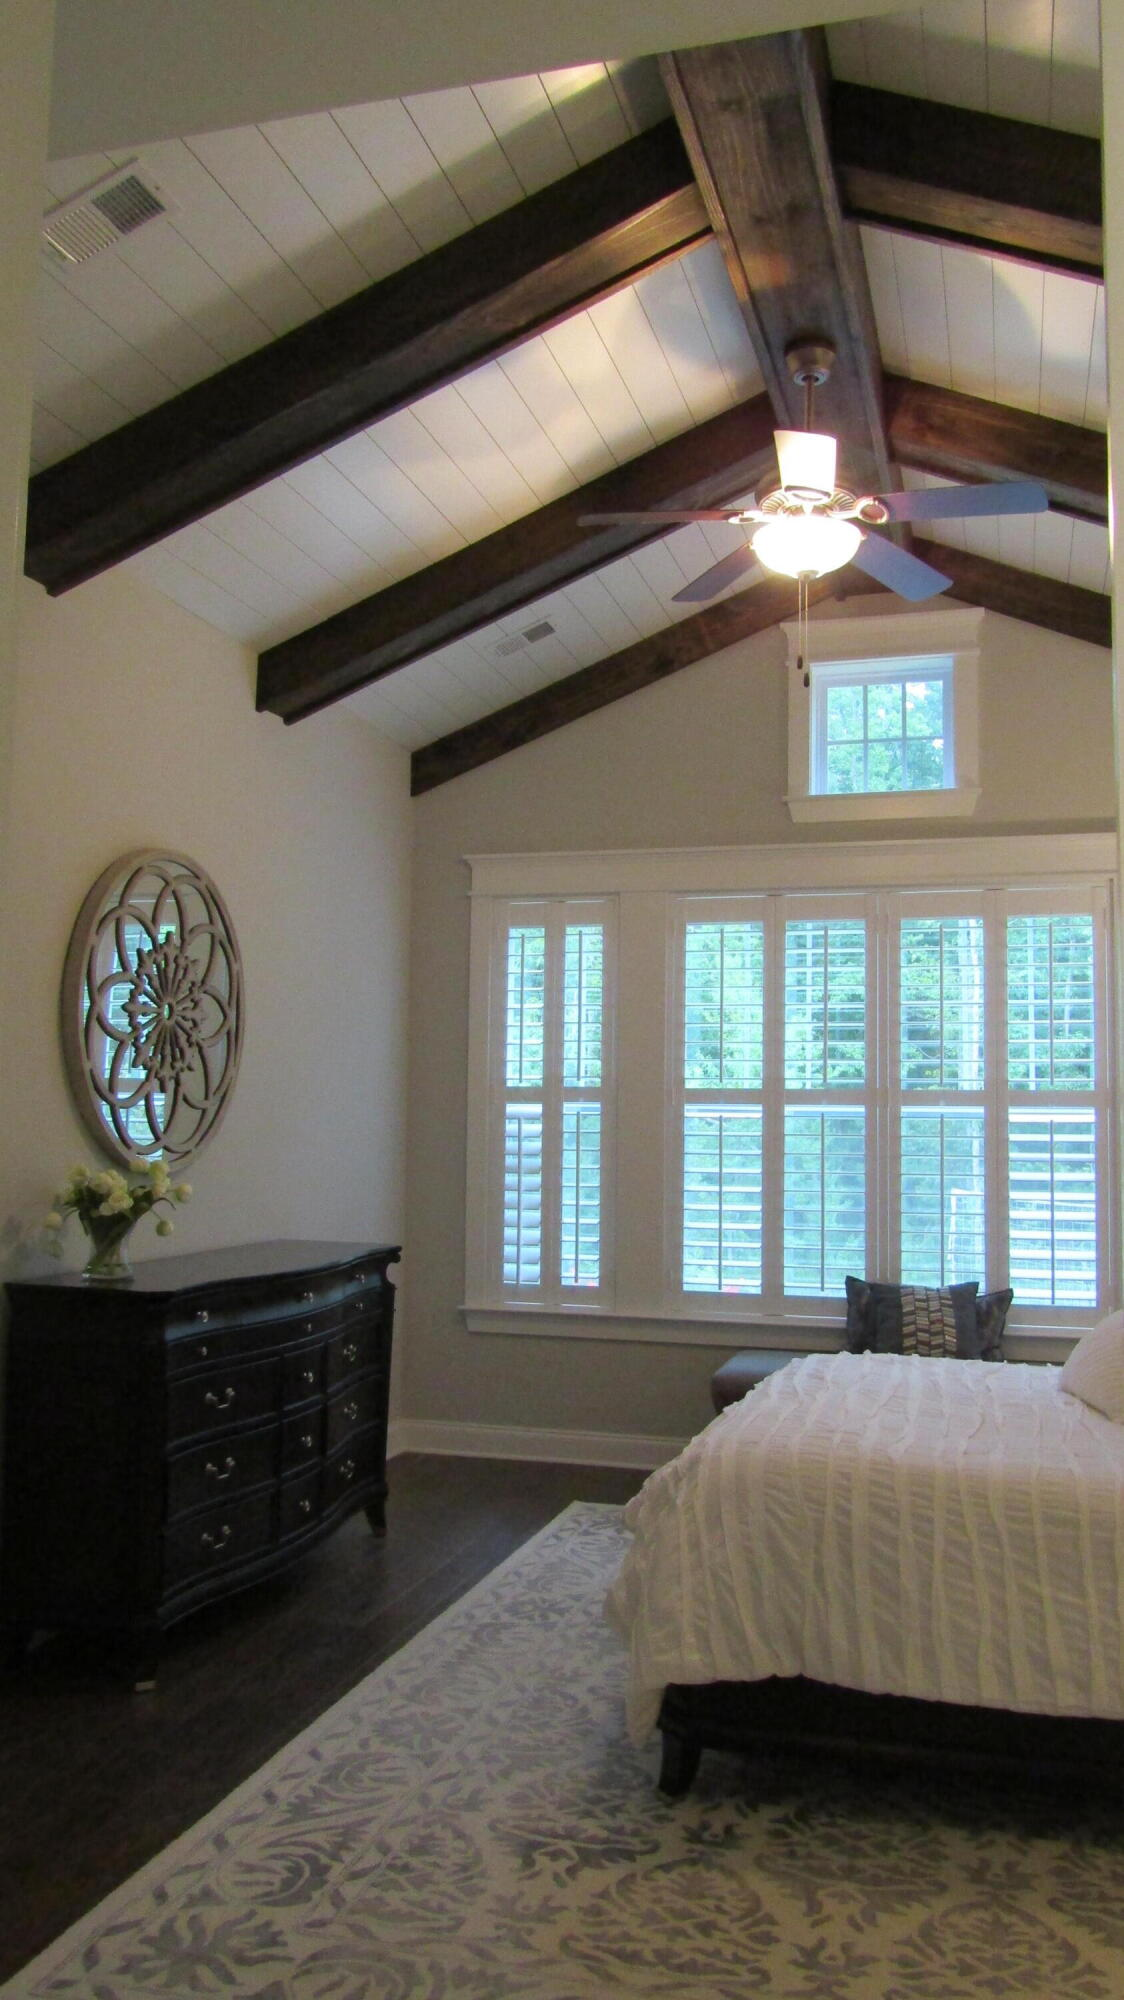 Carolina Park Homes For Sale - 3533 Crosstrees, Mount Pleasant, SC - 9